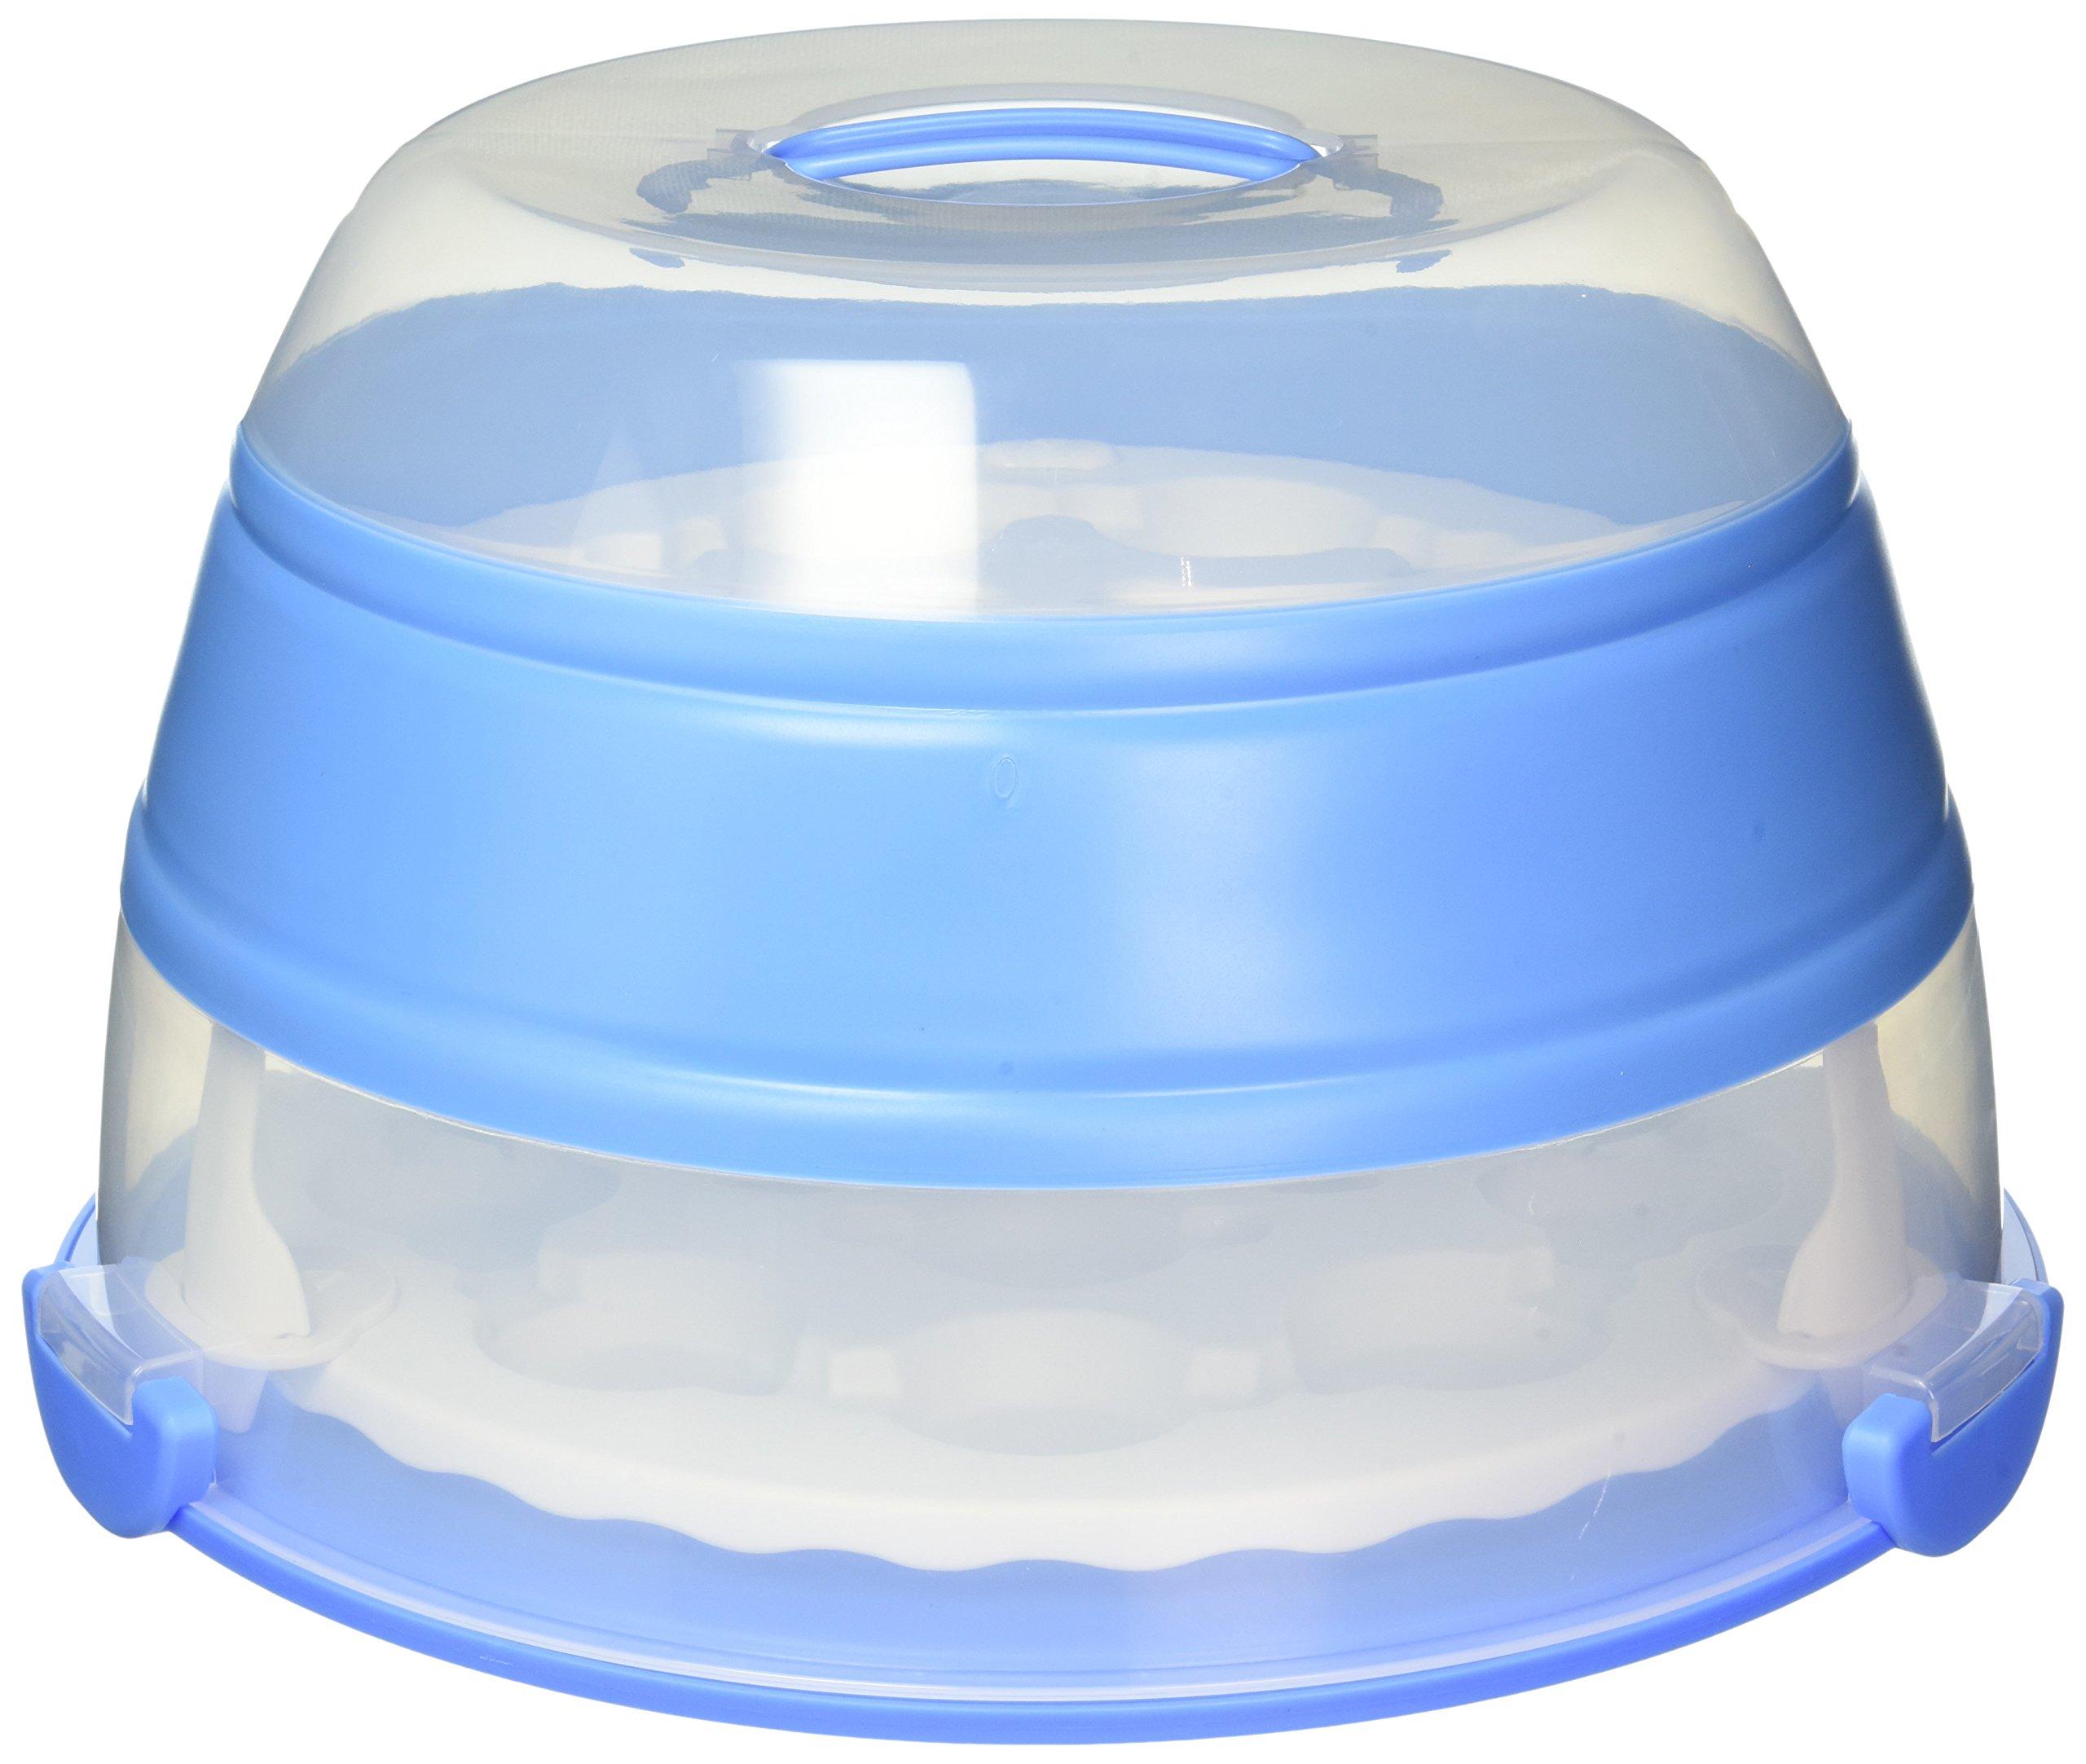 Prepworks by Progressive Collapsible Cupcake & Cake Carrier, Holds 24 Cupcakes by Progressive